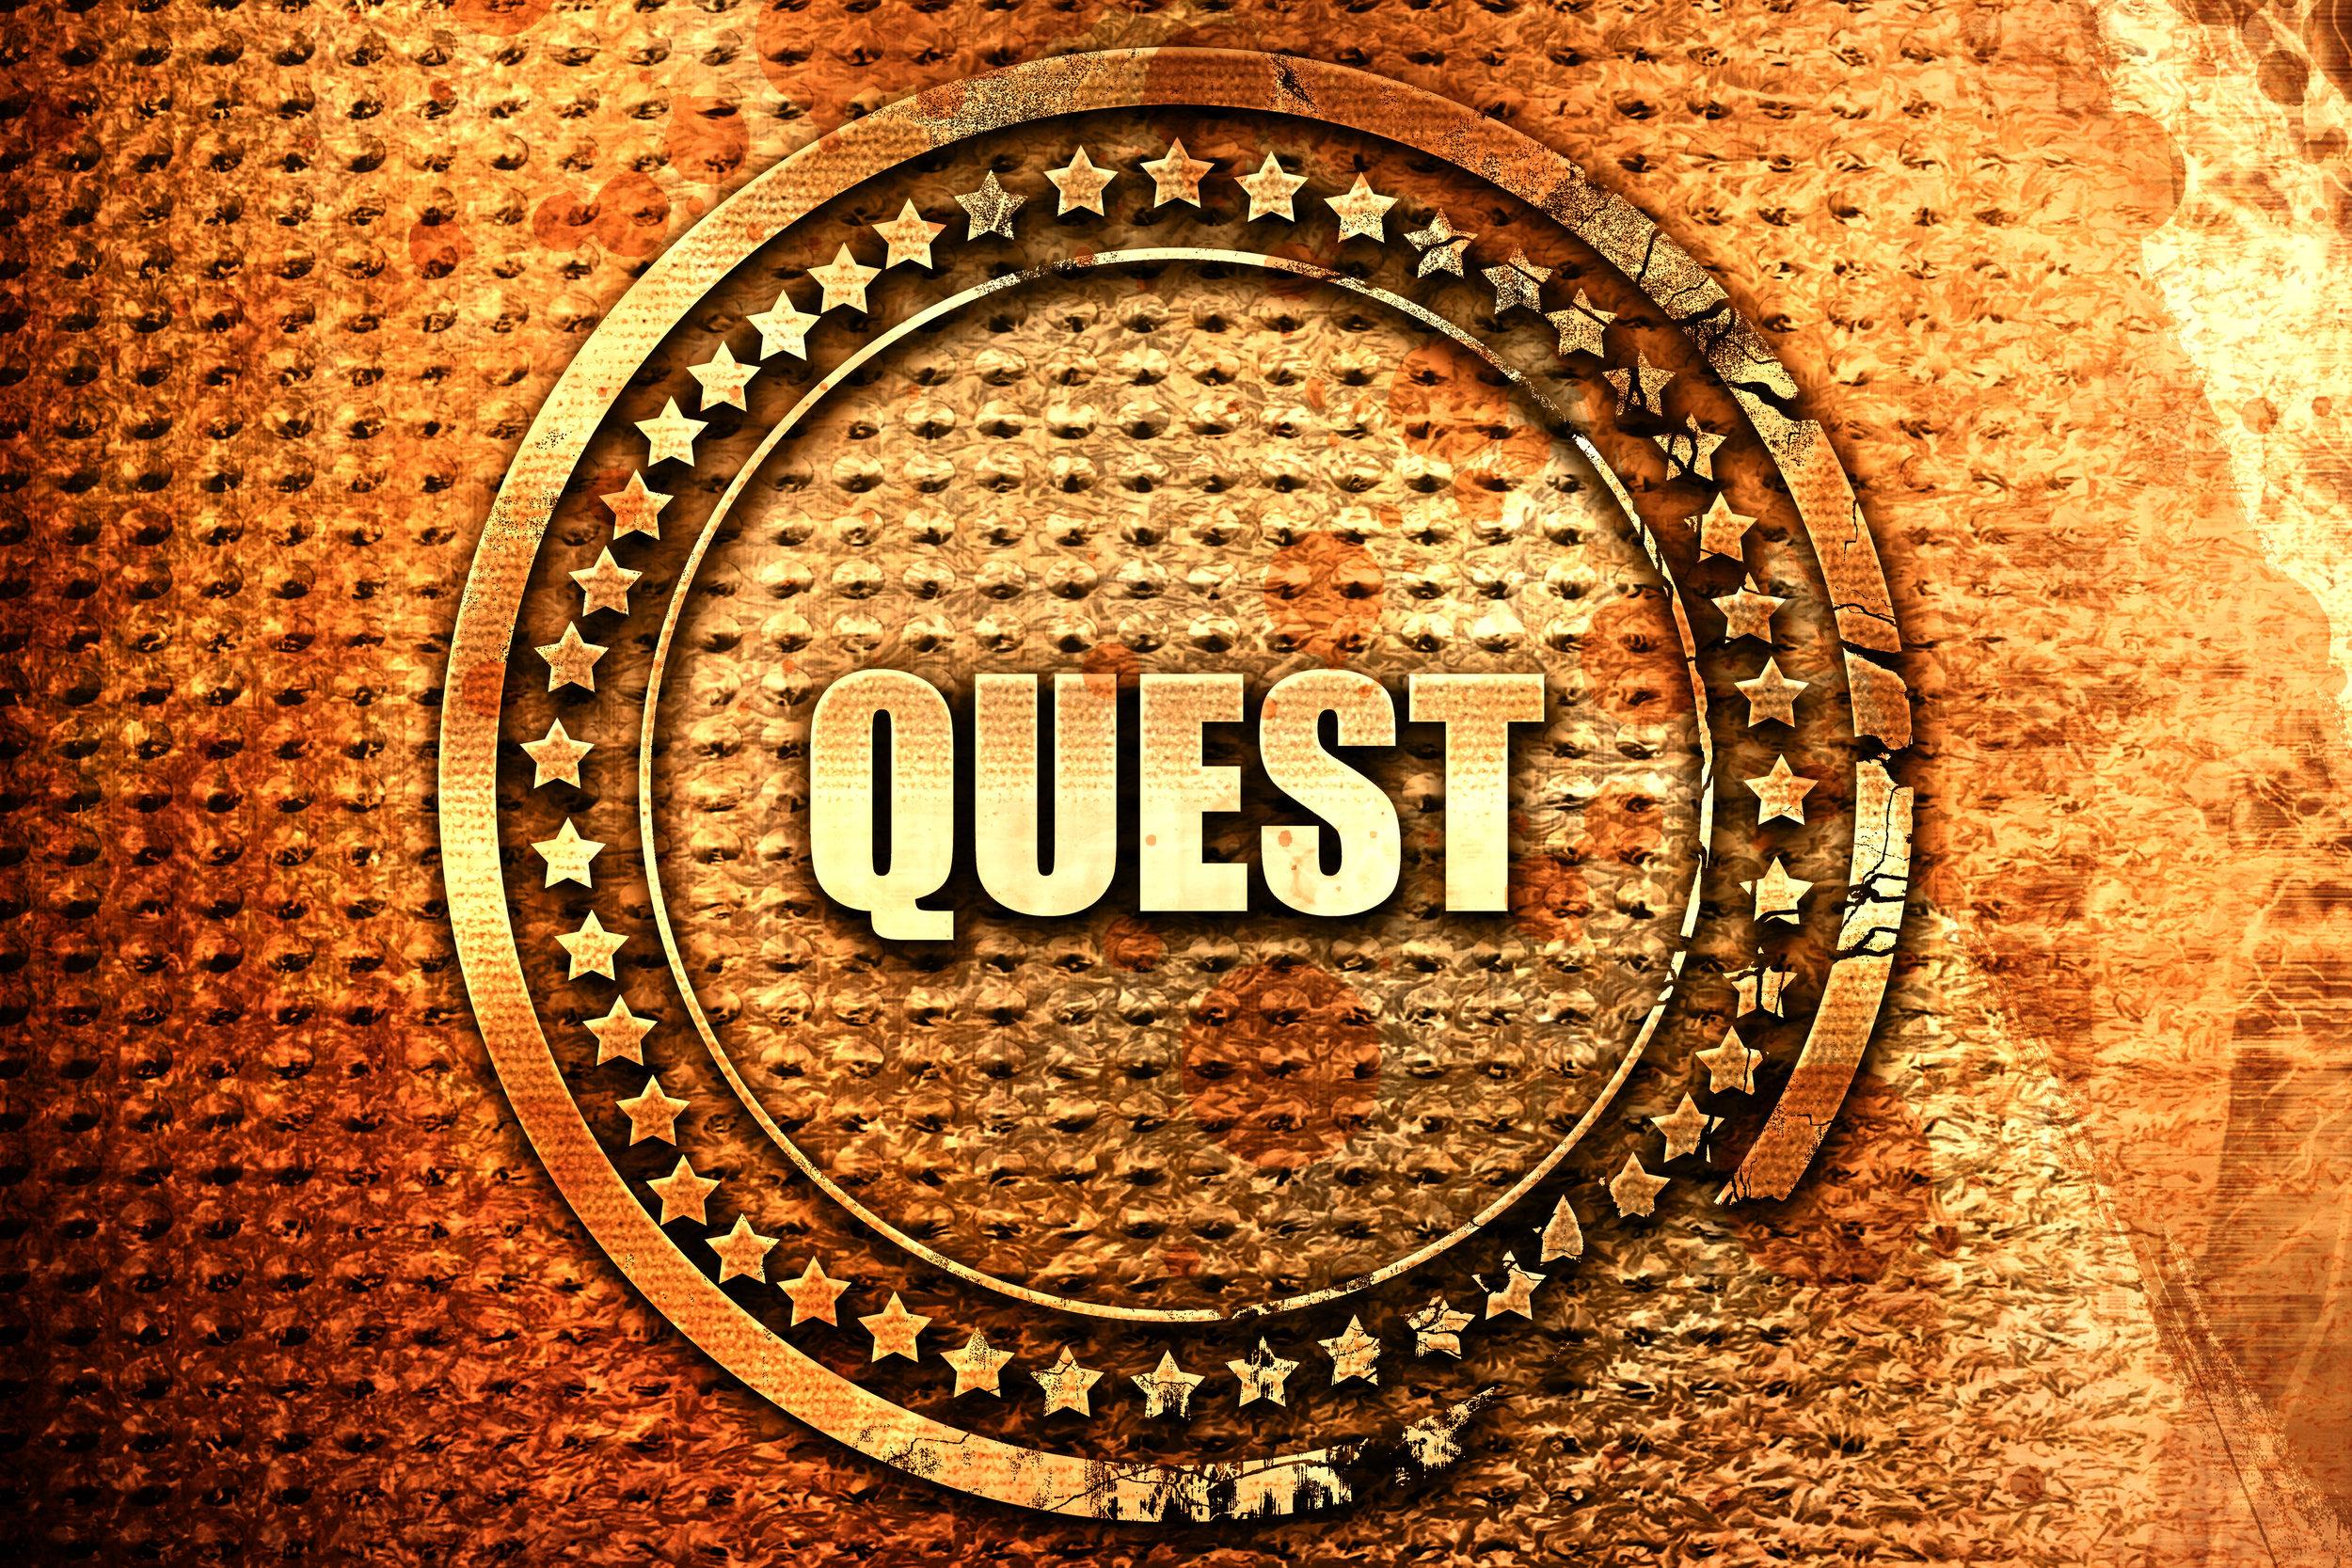 quest, 3D rendering, text on metal